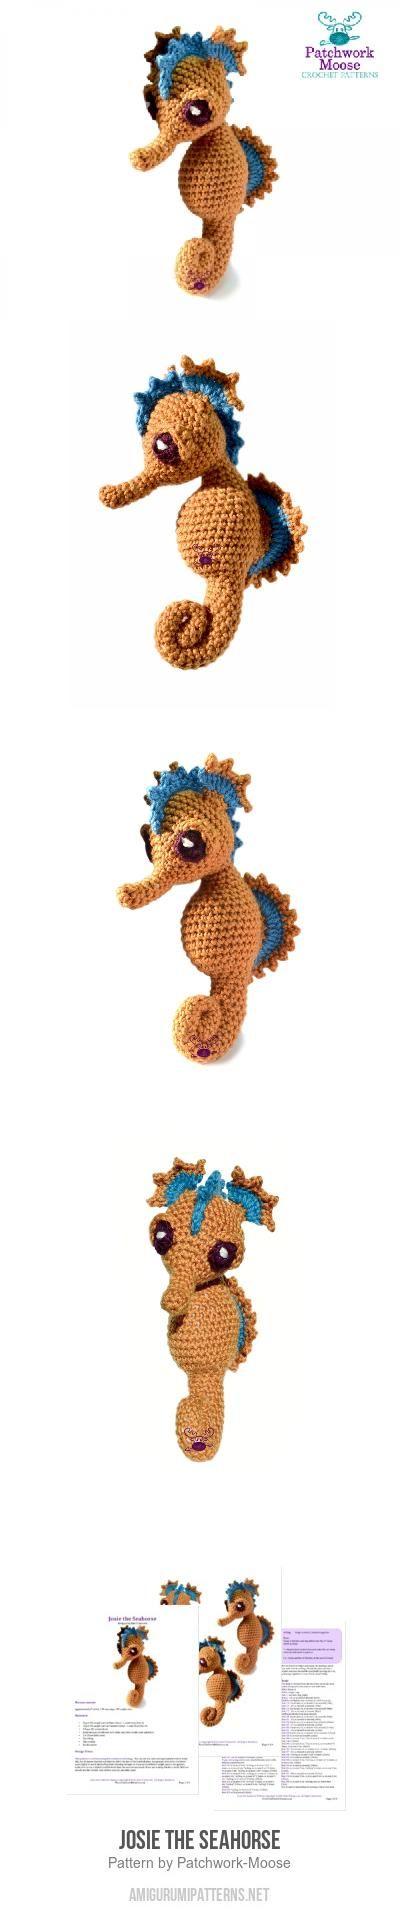 Josie the Seahorse amigurumi pattern | Crochet animals | Pinterest ...